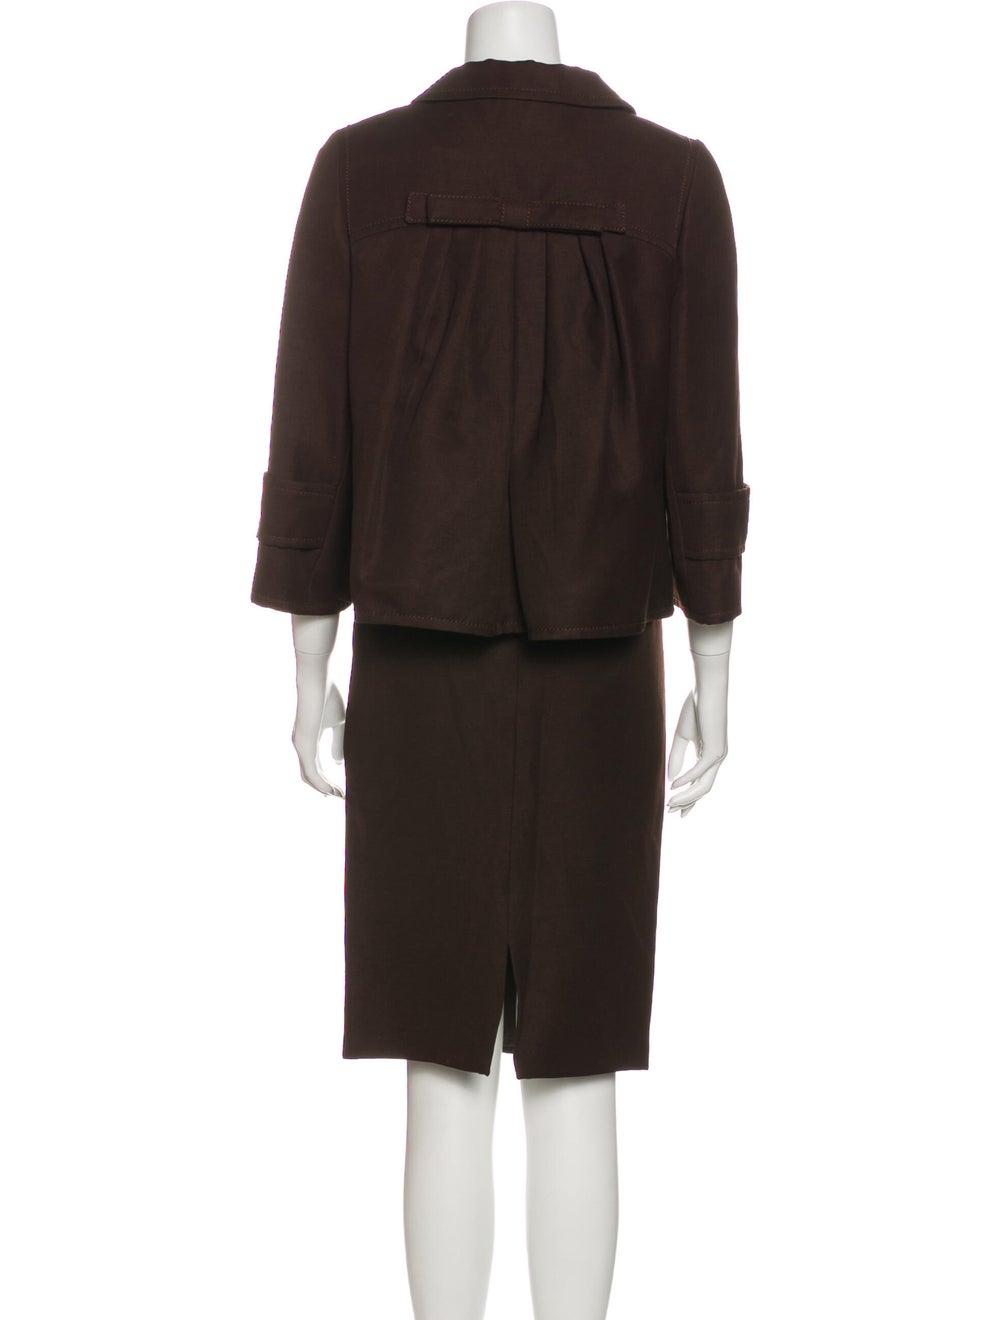 Andrew Gn Linen Skirt Suit Brown - image 3